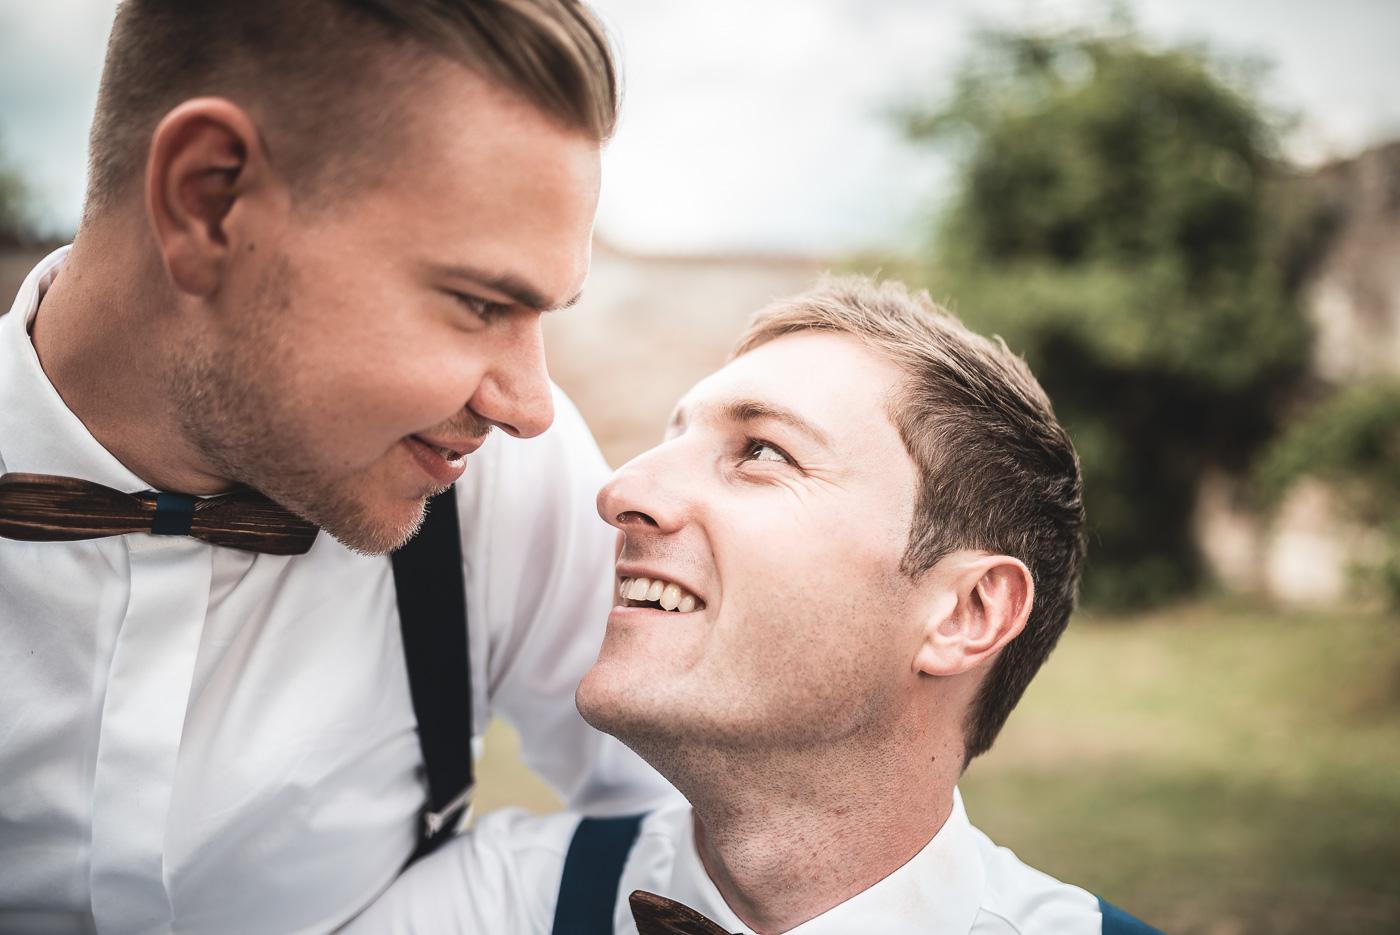 Bräutigam und Bräutigam beim Paarshooting